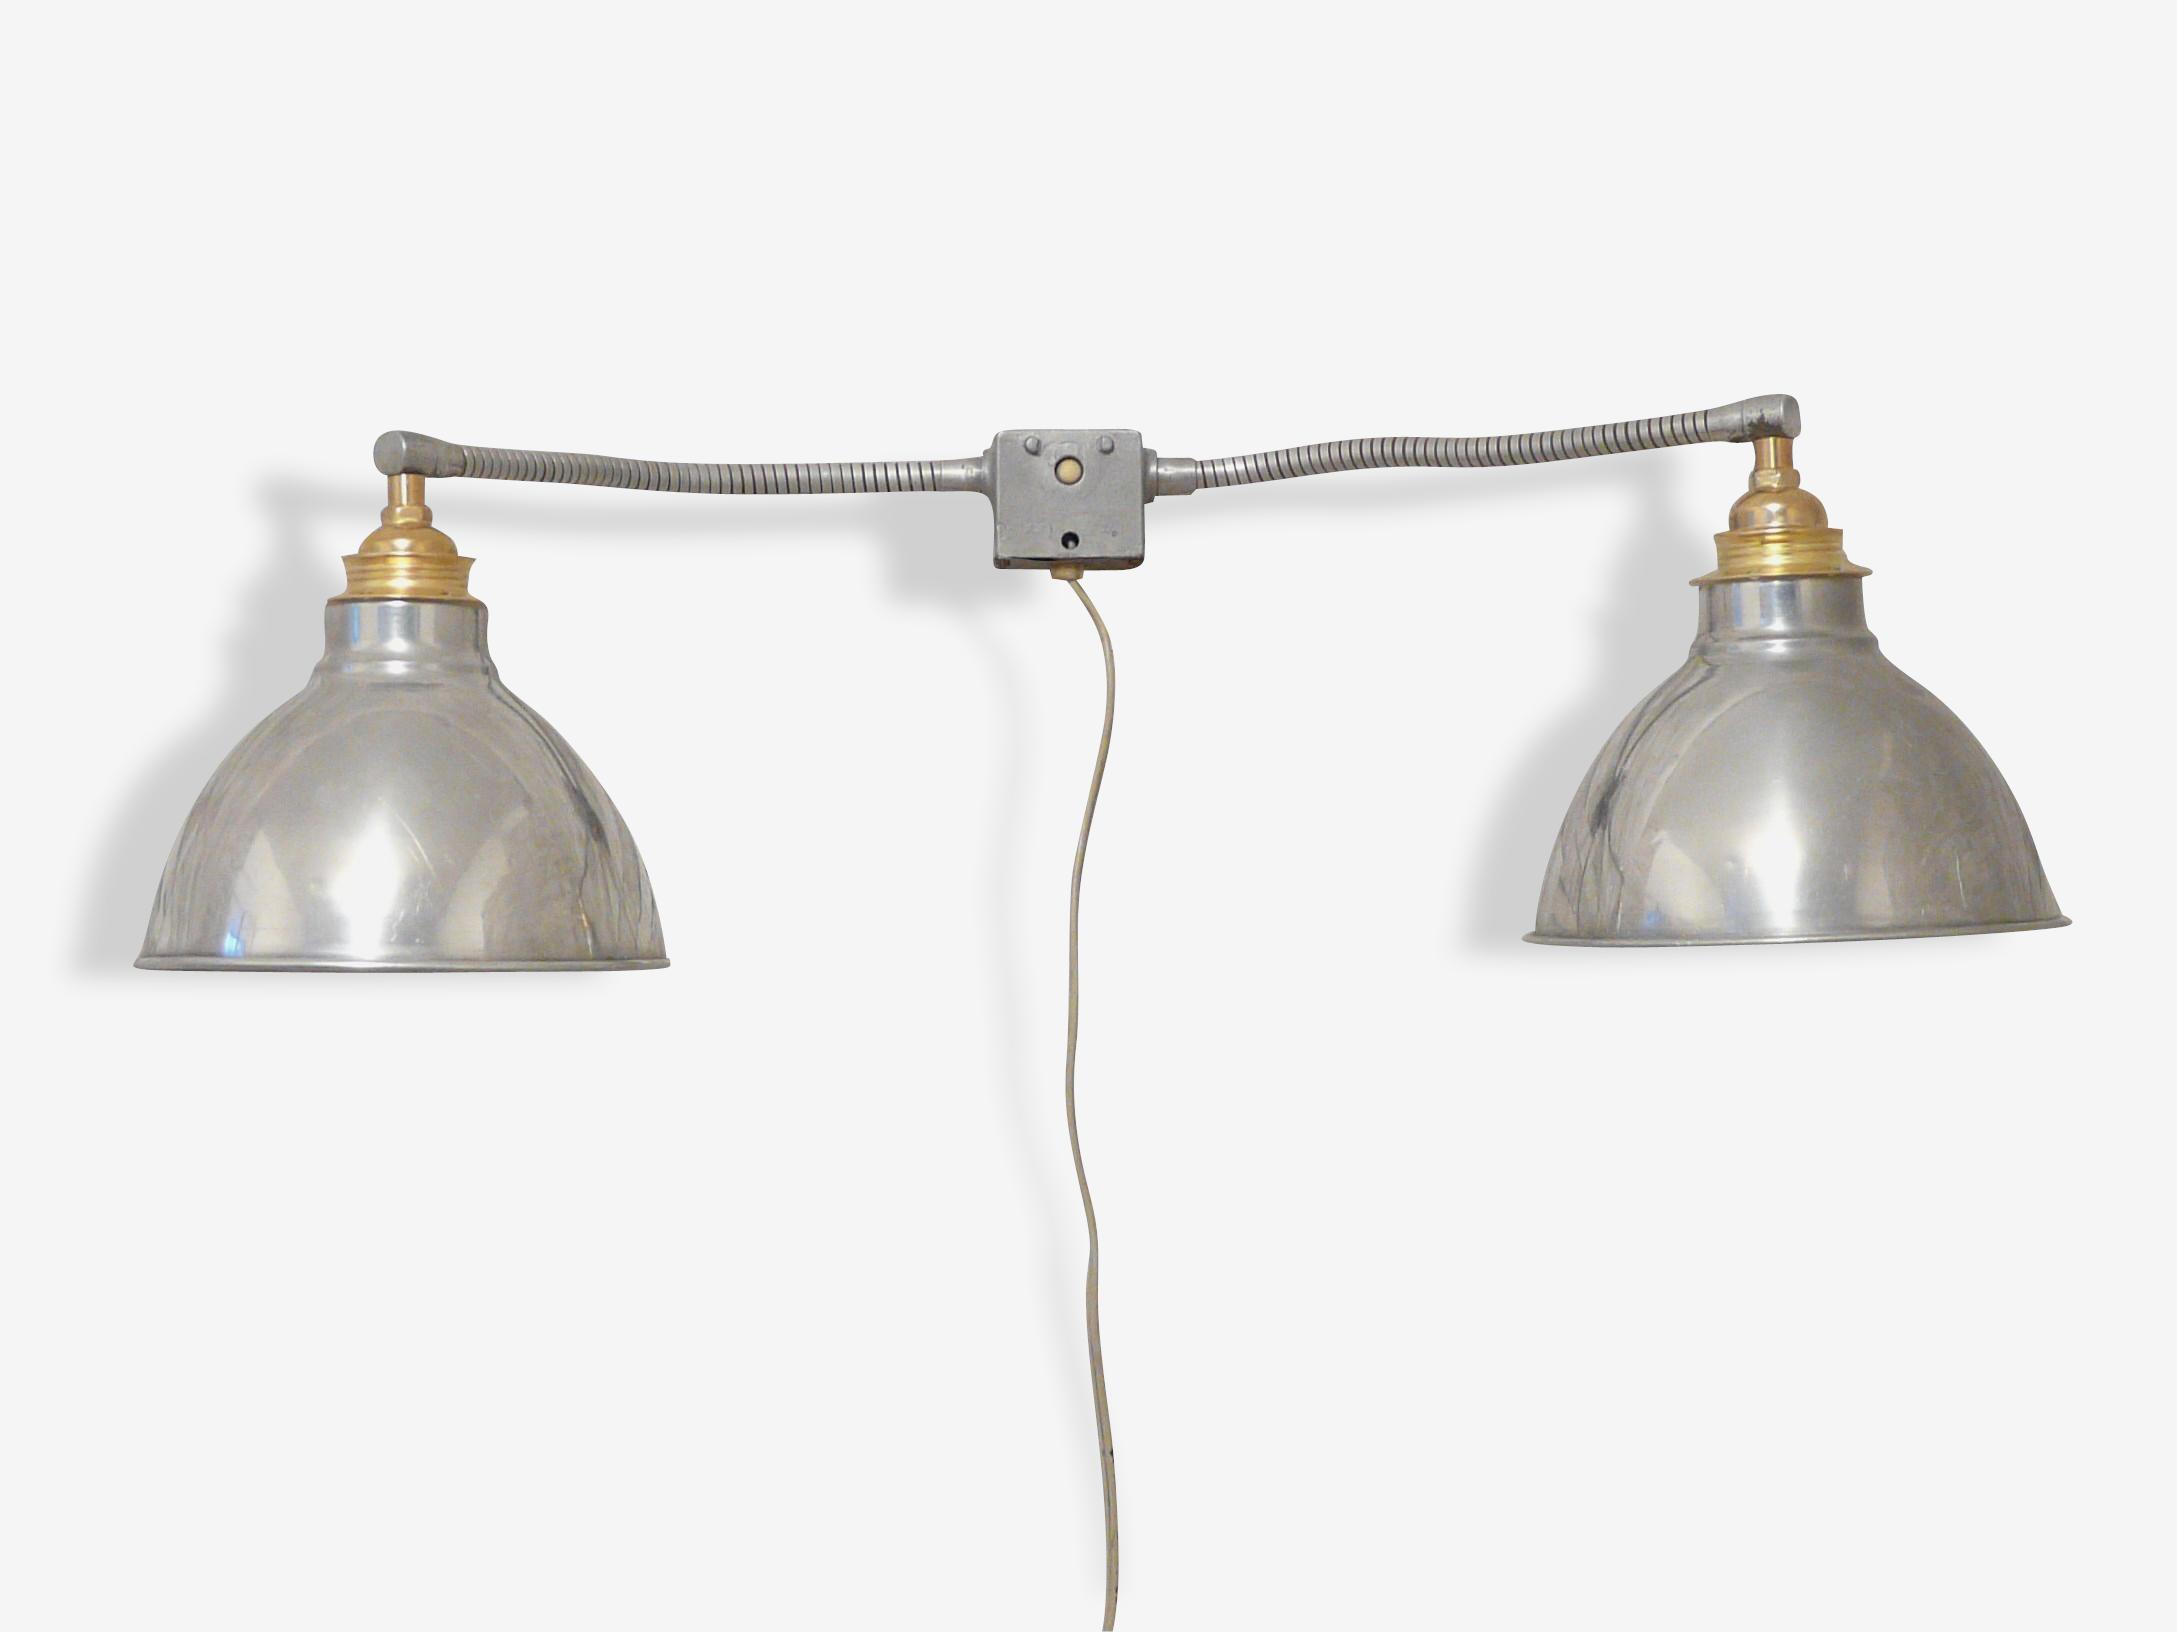 Lampe double flexible 1950